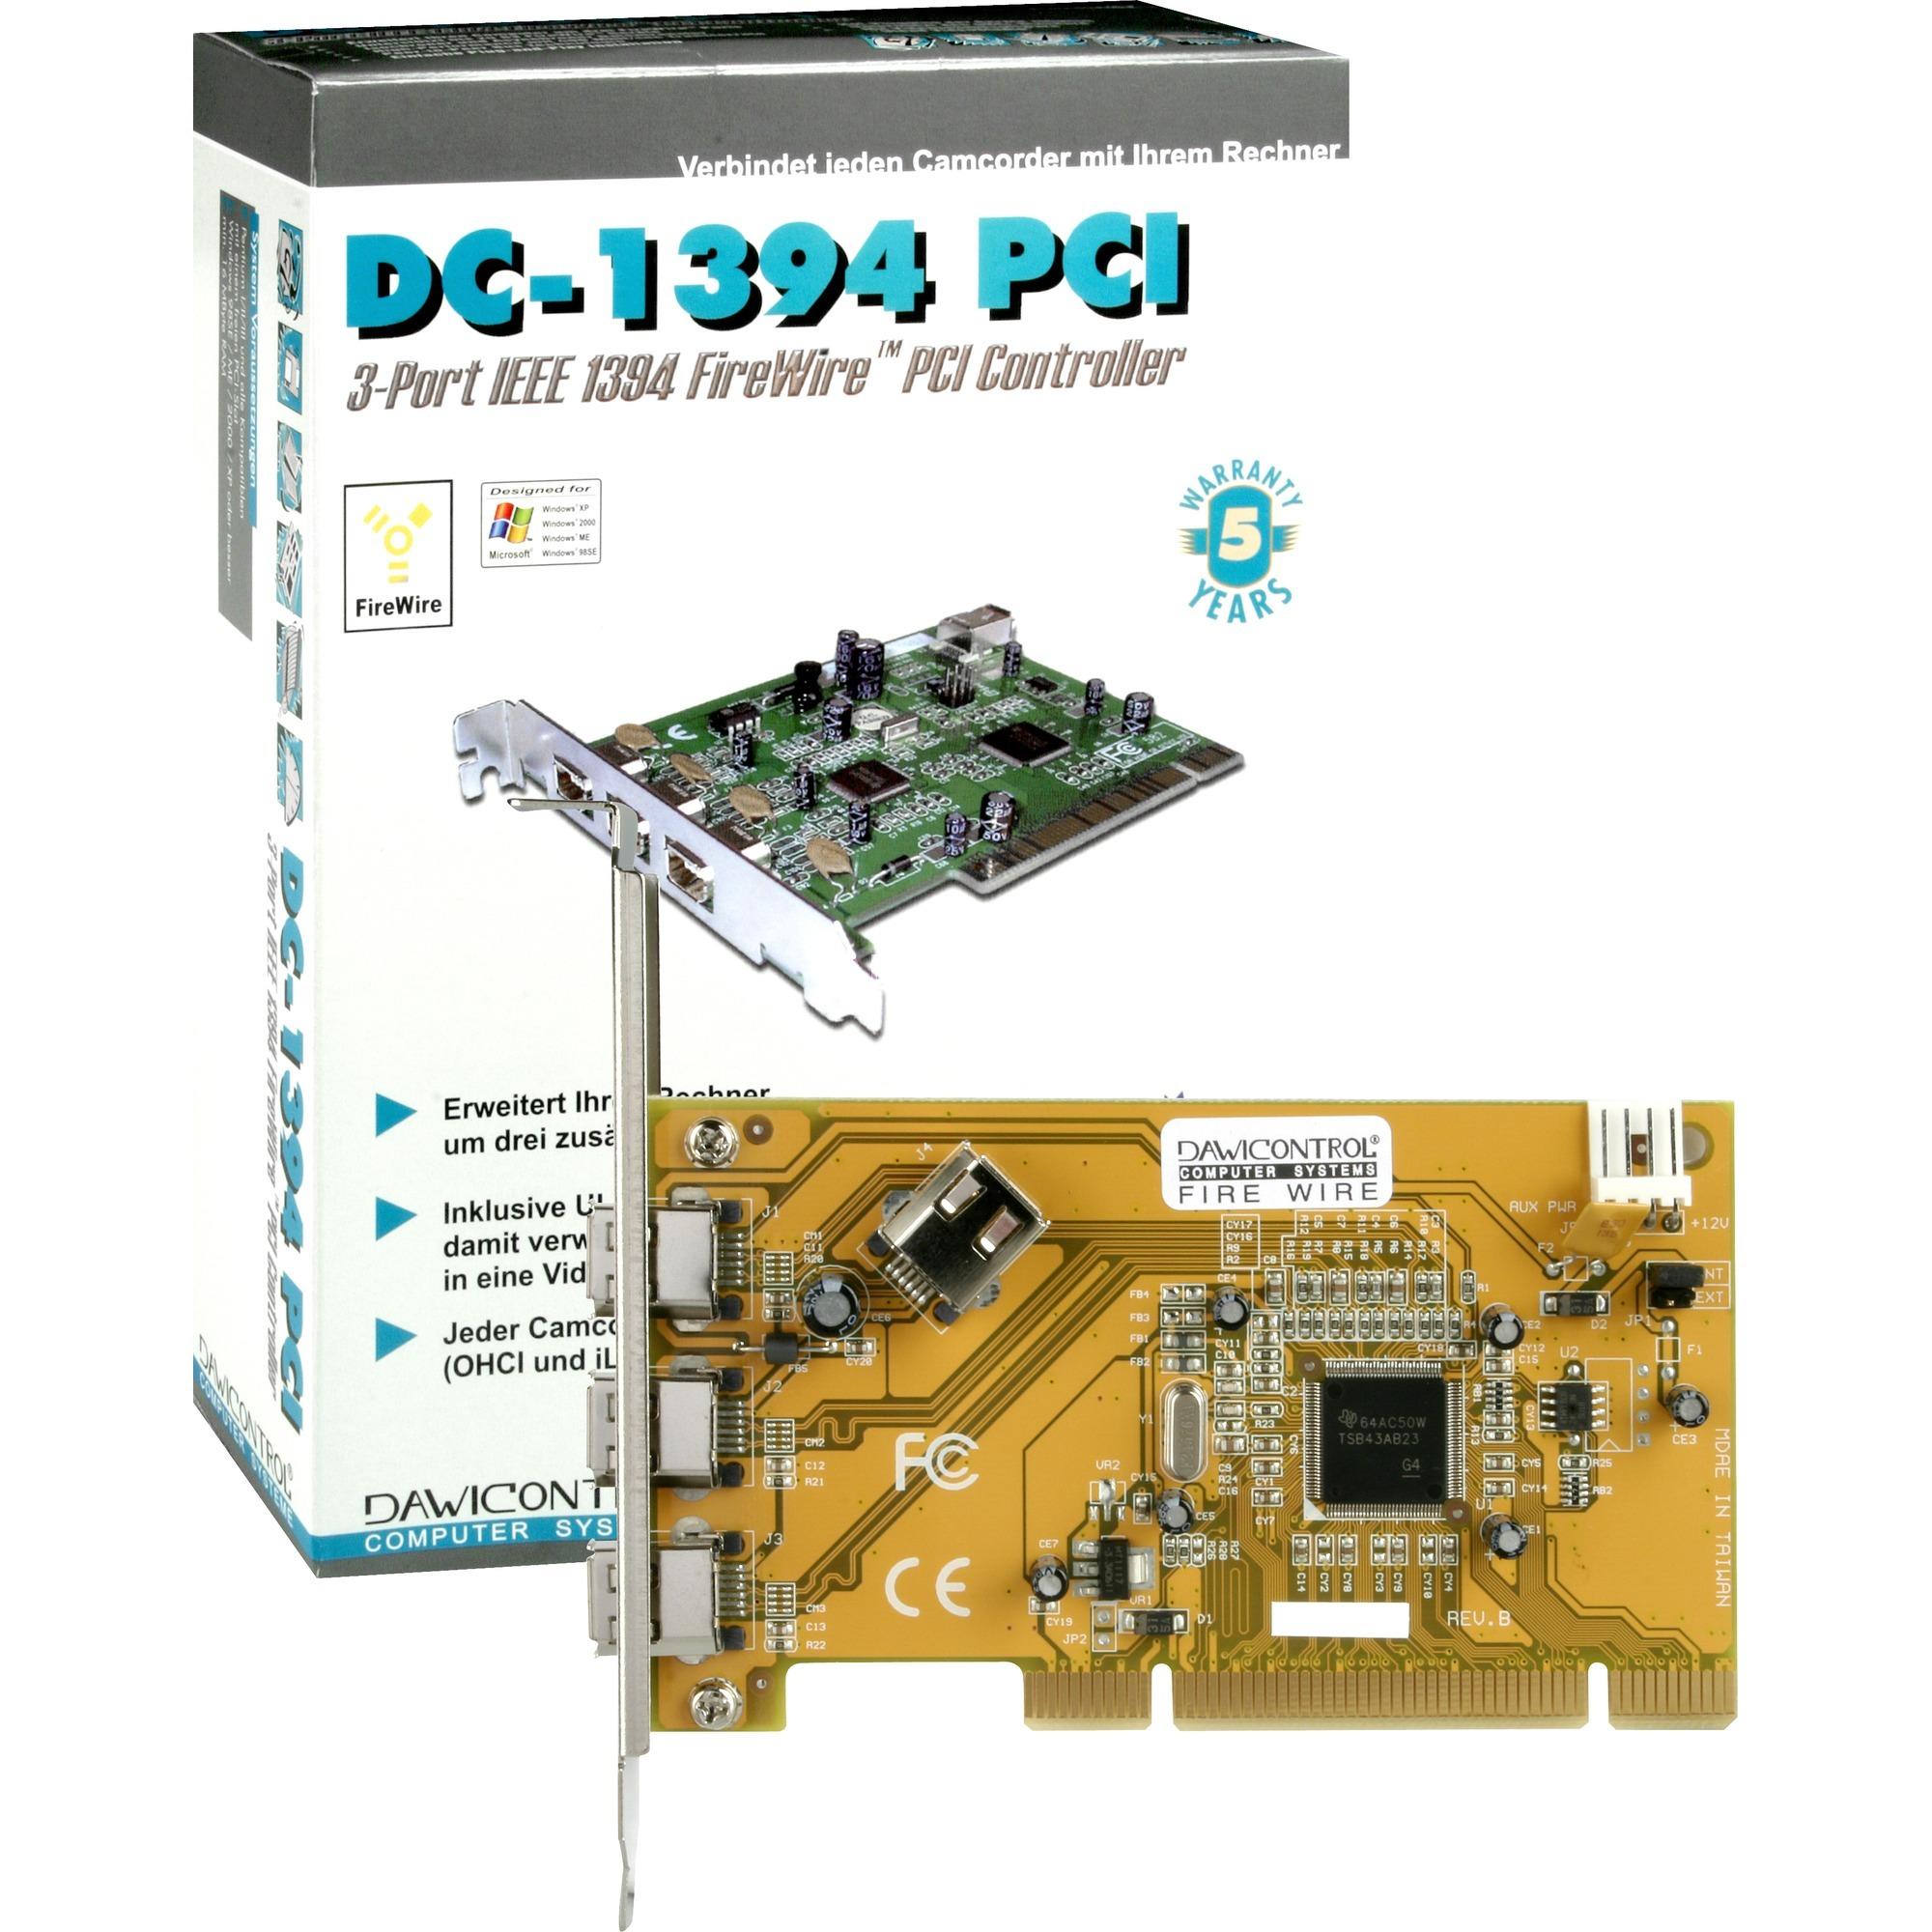 DC-1394 PCI FireWire Controller tarjeta y adaptador de interfaz, Controlador